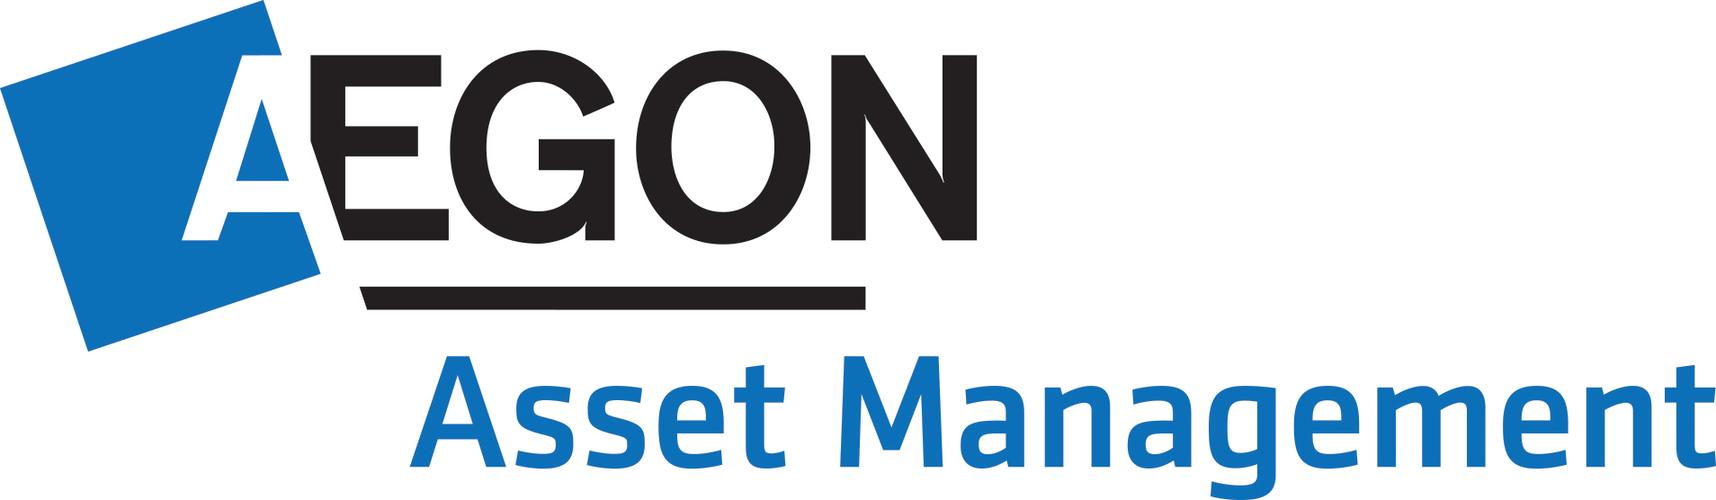 Aegon Asset Management